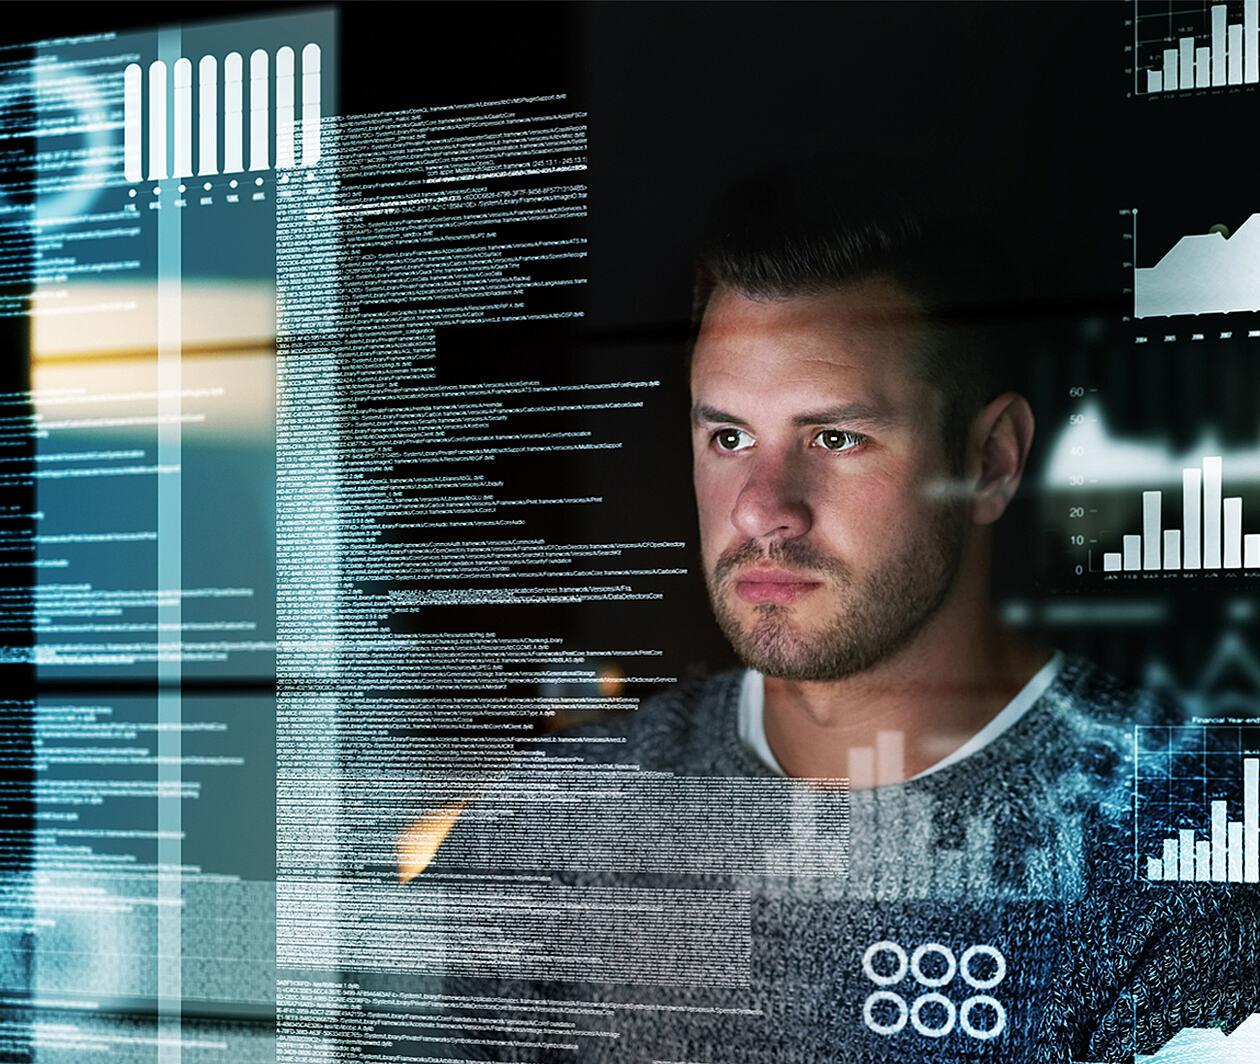 Data Analytics Using Python: Data Wrangling and Ingestion